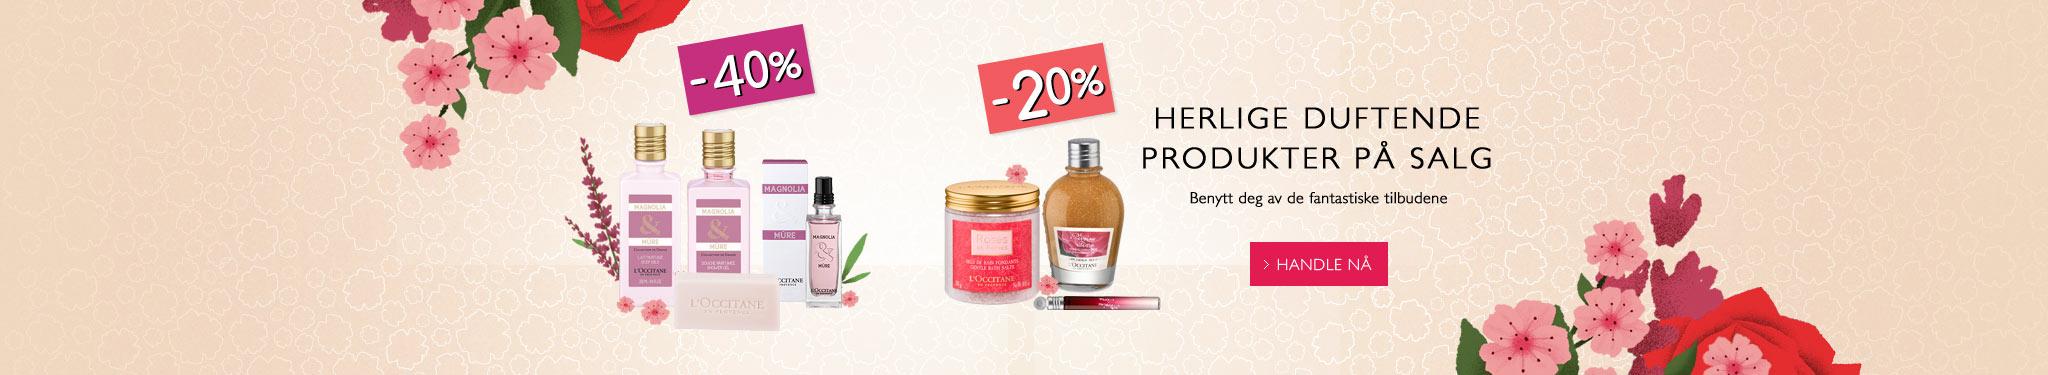 Herlige duftende produkter på salg